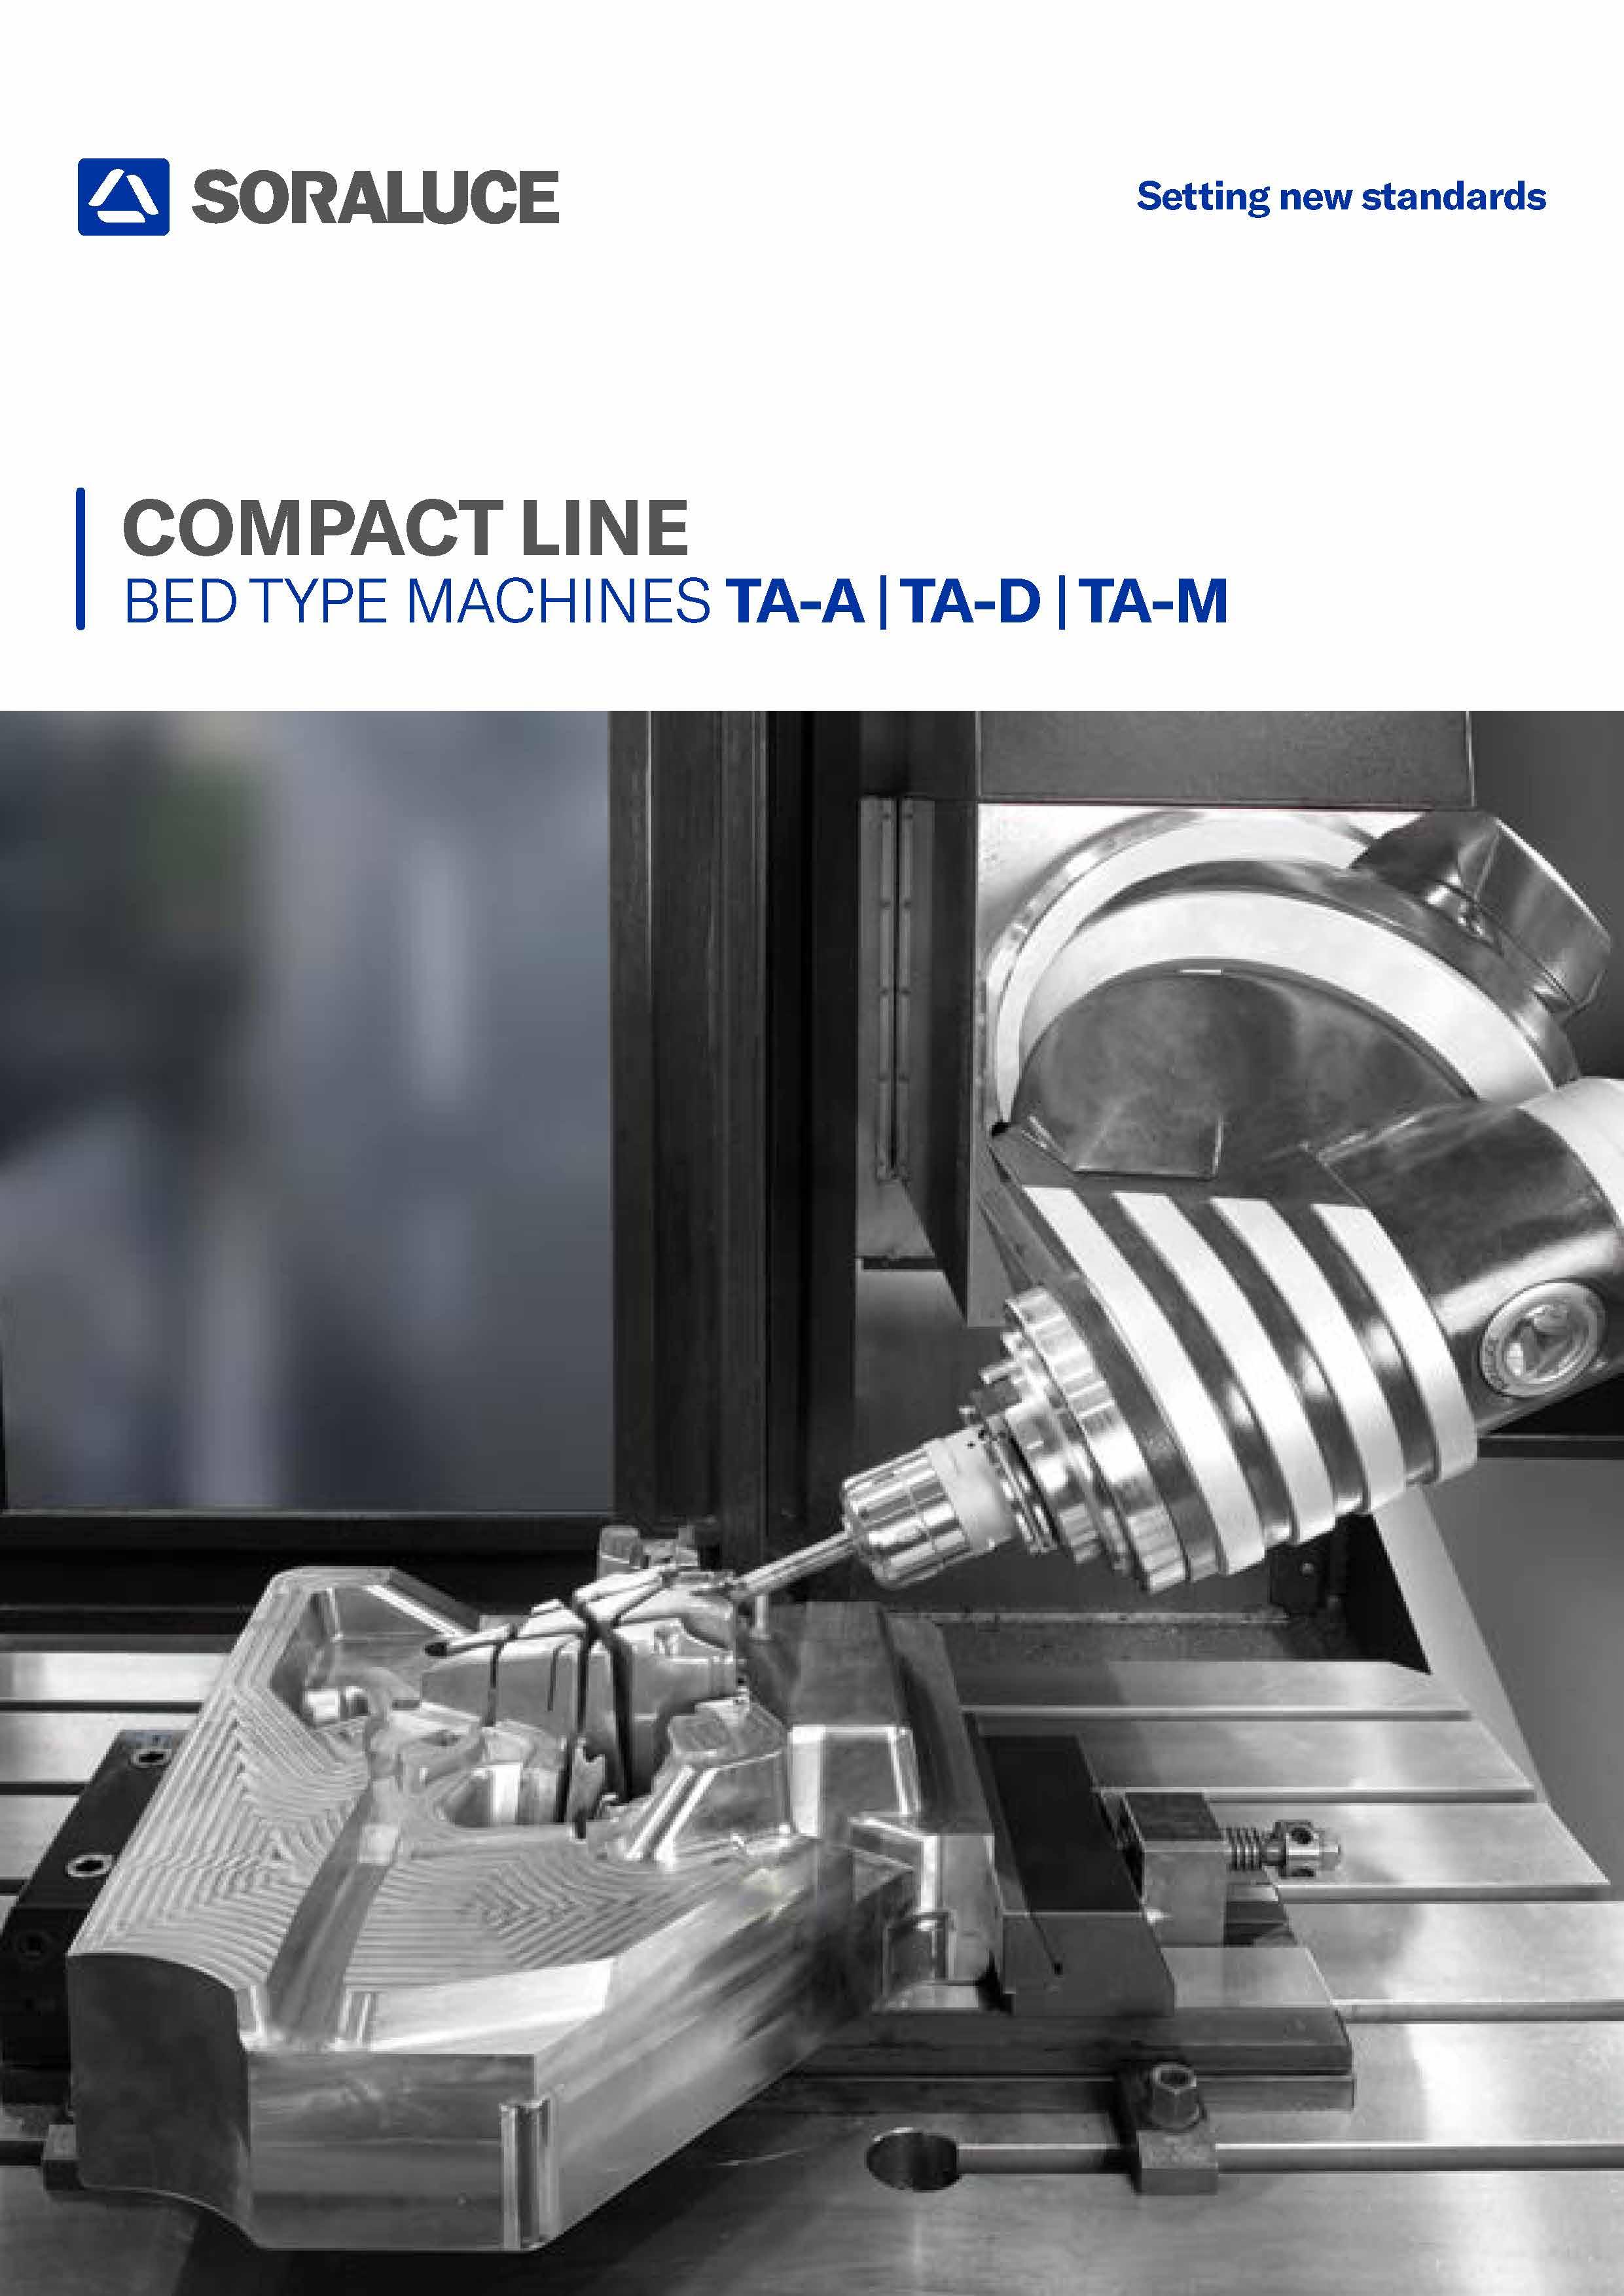 SORALUCE TA-D Bed type milling machine